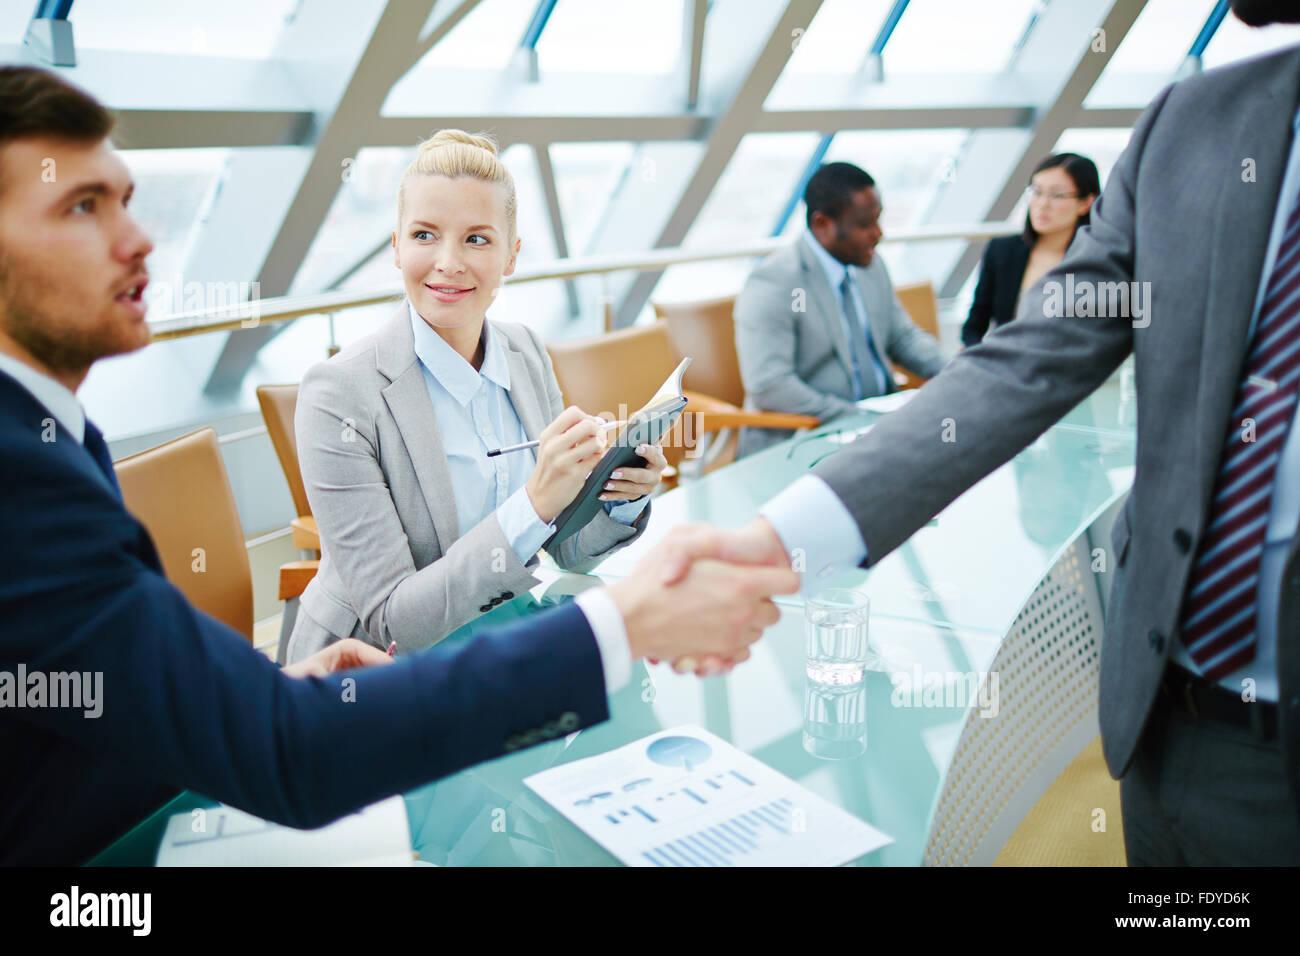 Happy businesswoman looking at one of businessman handshaking avec partner Photo Stock